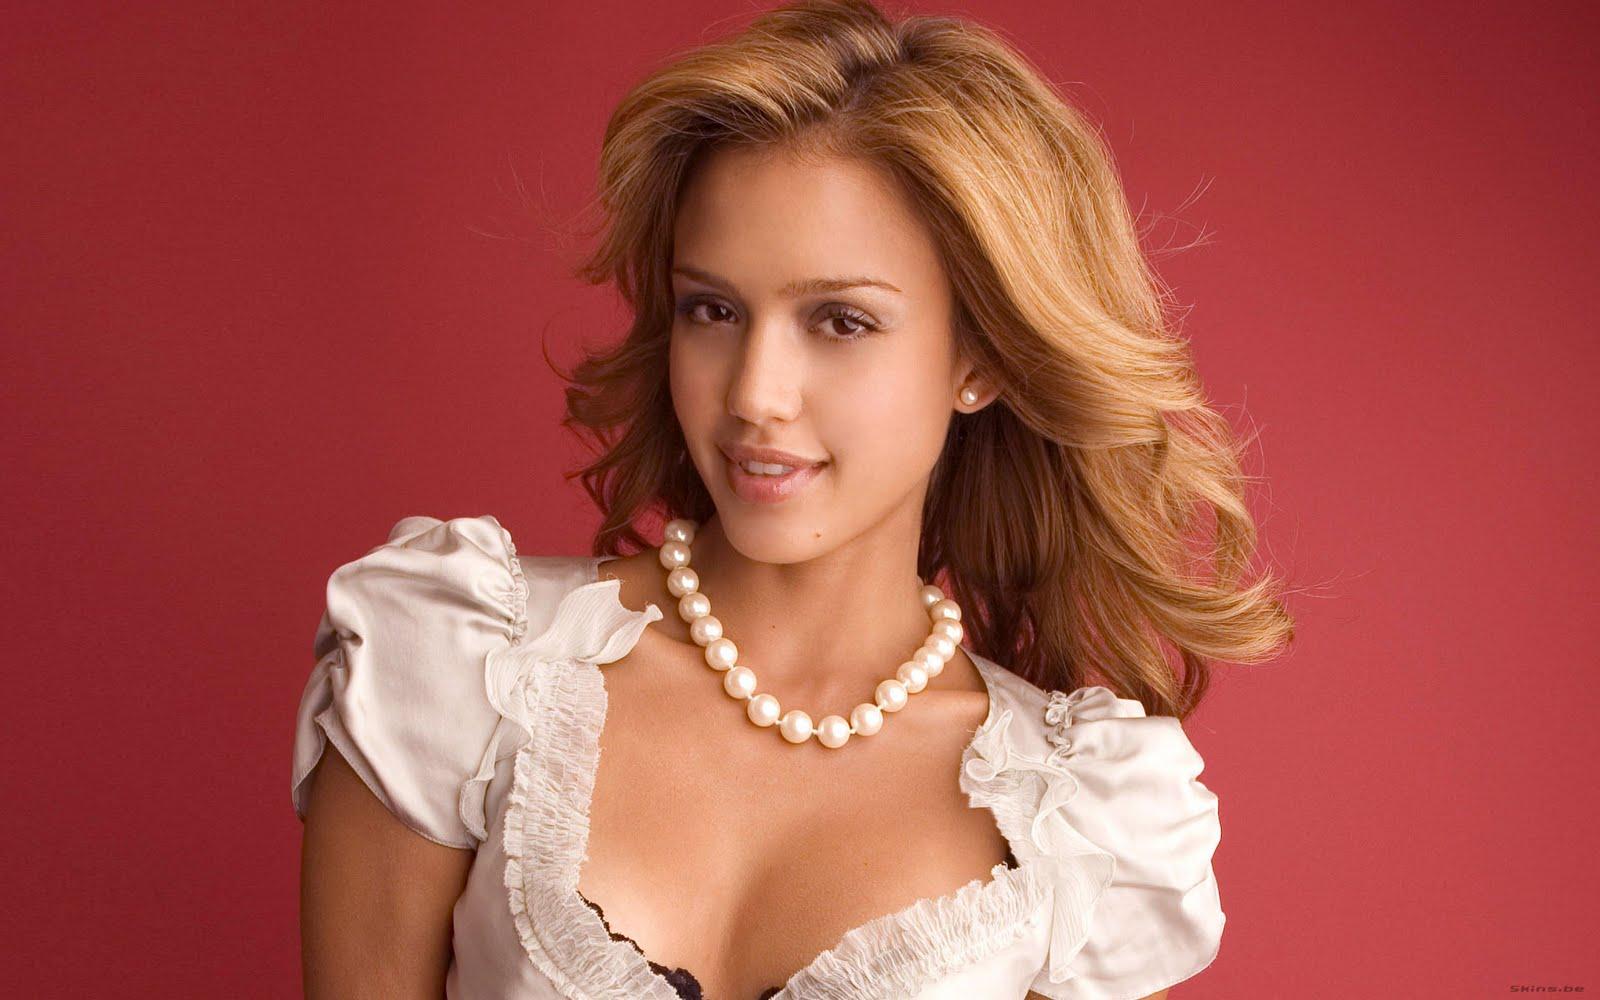 http://2.bp.blogspot.com/-Ofcmb71FrLE/Th8NUEJA-CI/AAAAAAAABv0/142HIraCqVo/s1600/Cute-Jessica-Alba-wallpaper.jpg